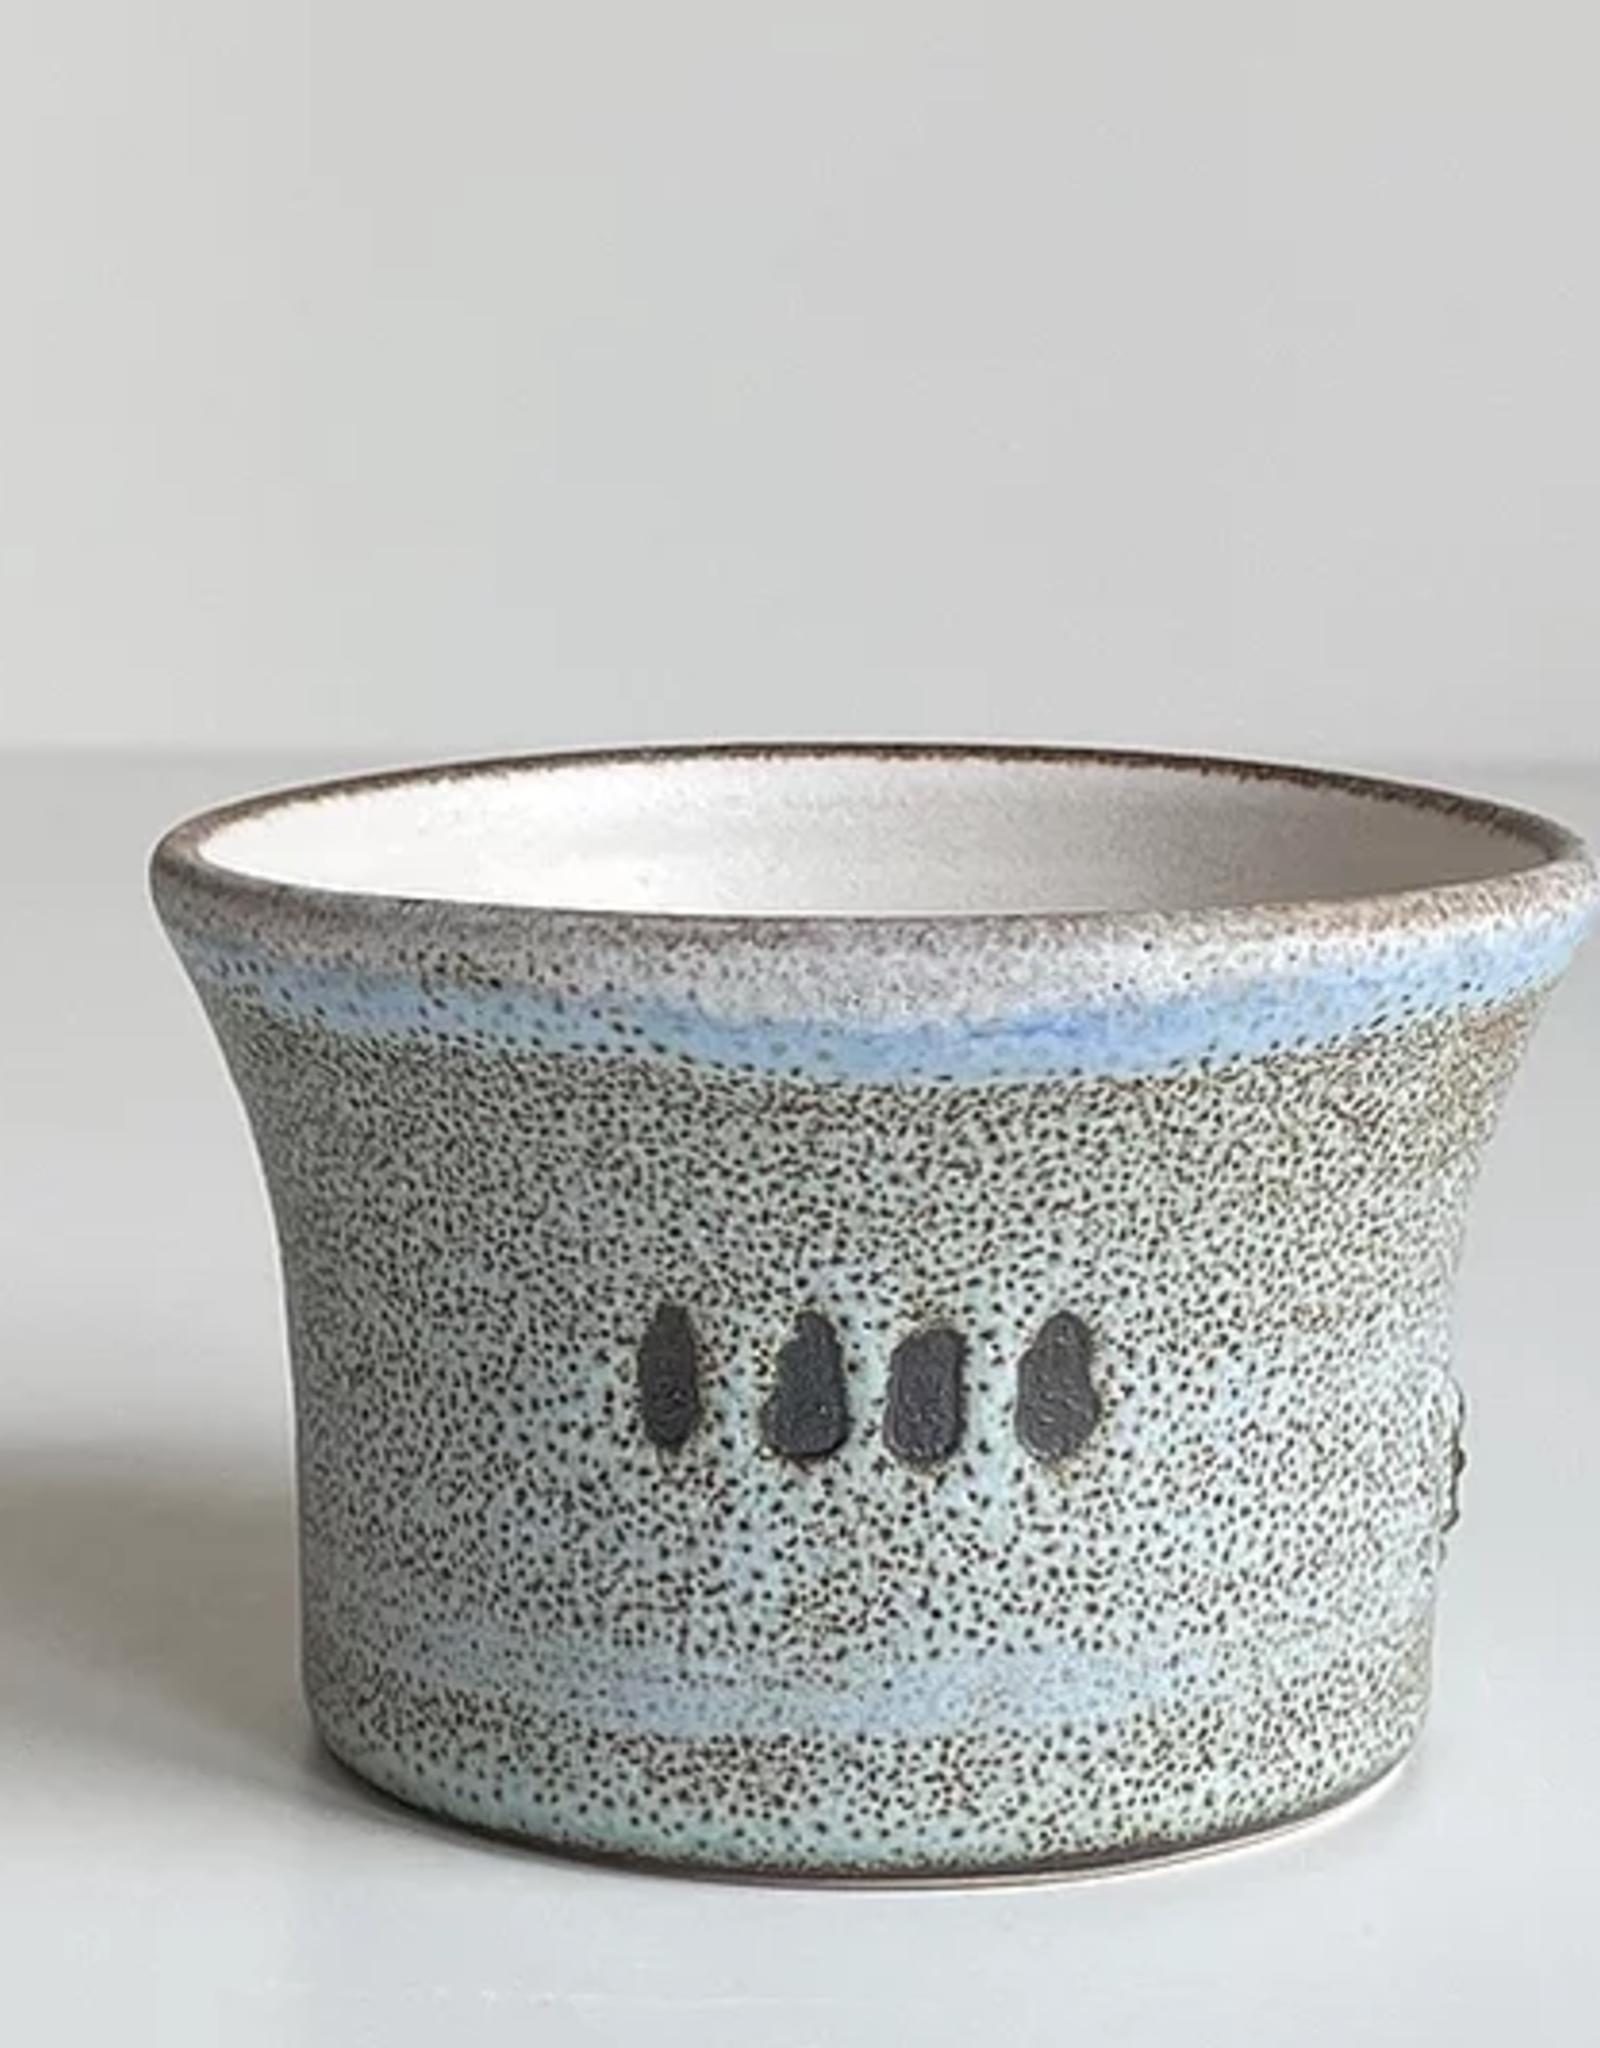 Magda Bethani MBC/BSBD Small bowl Blue with dots